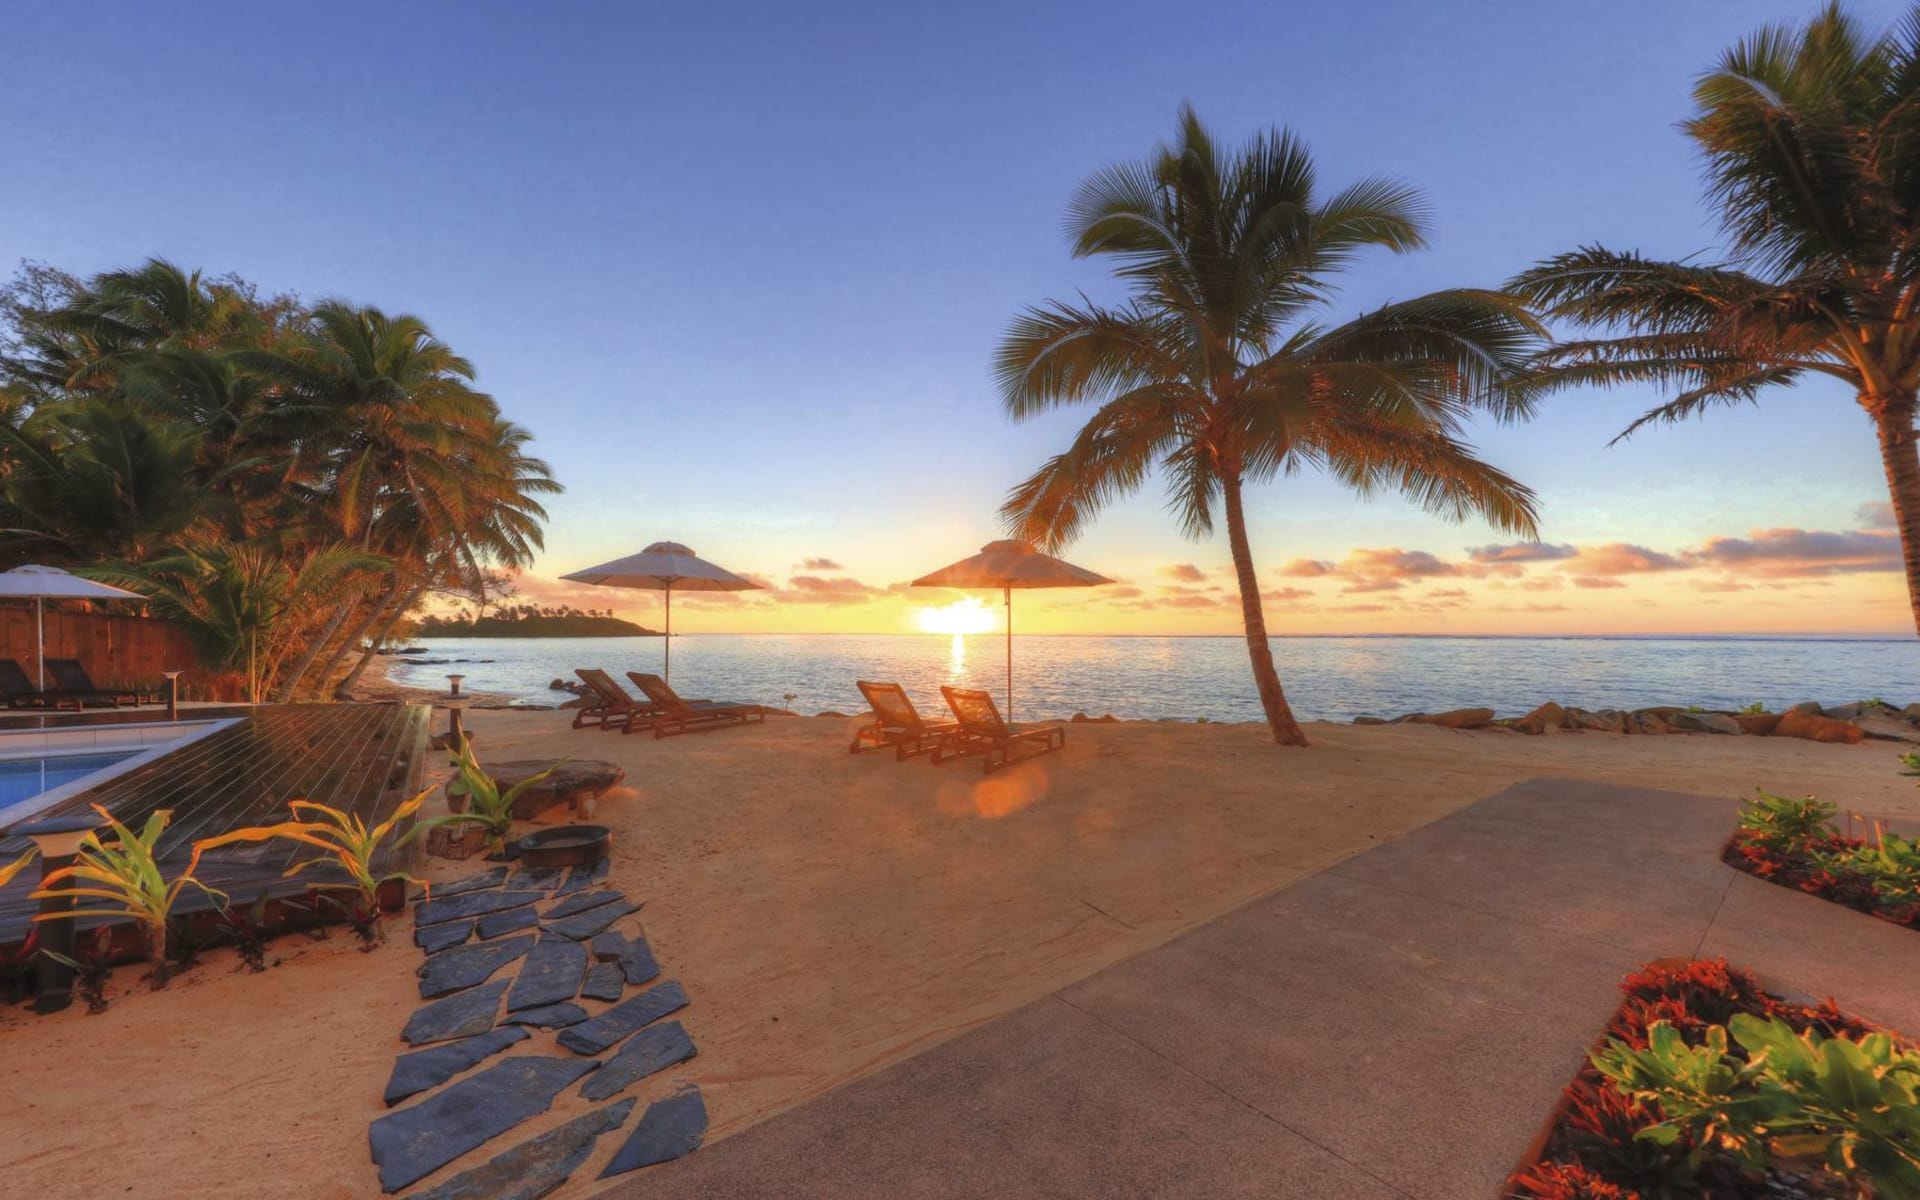 Moana Sands Lagoon Resort in Rarotonga: Exterior Moana-Sands-Lagoon-Resort - Muri-Sunrise cTurama